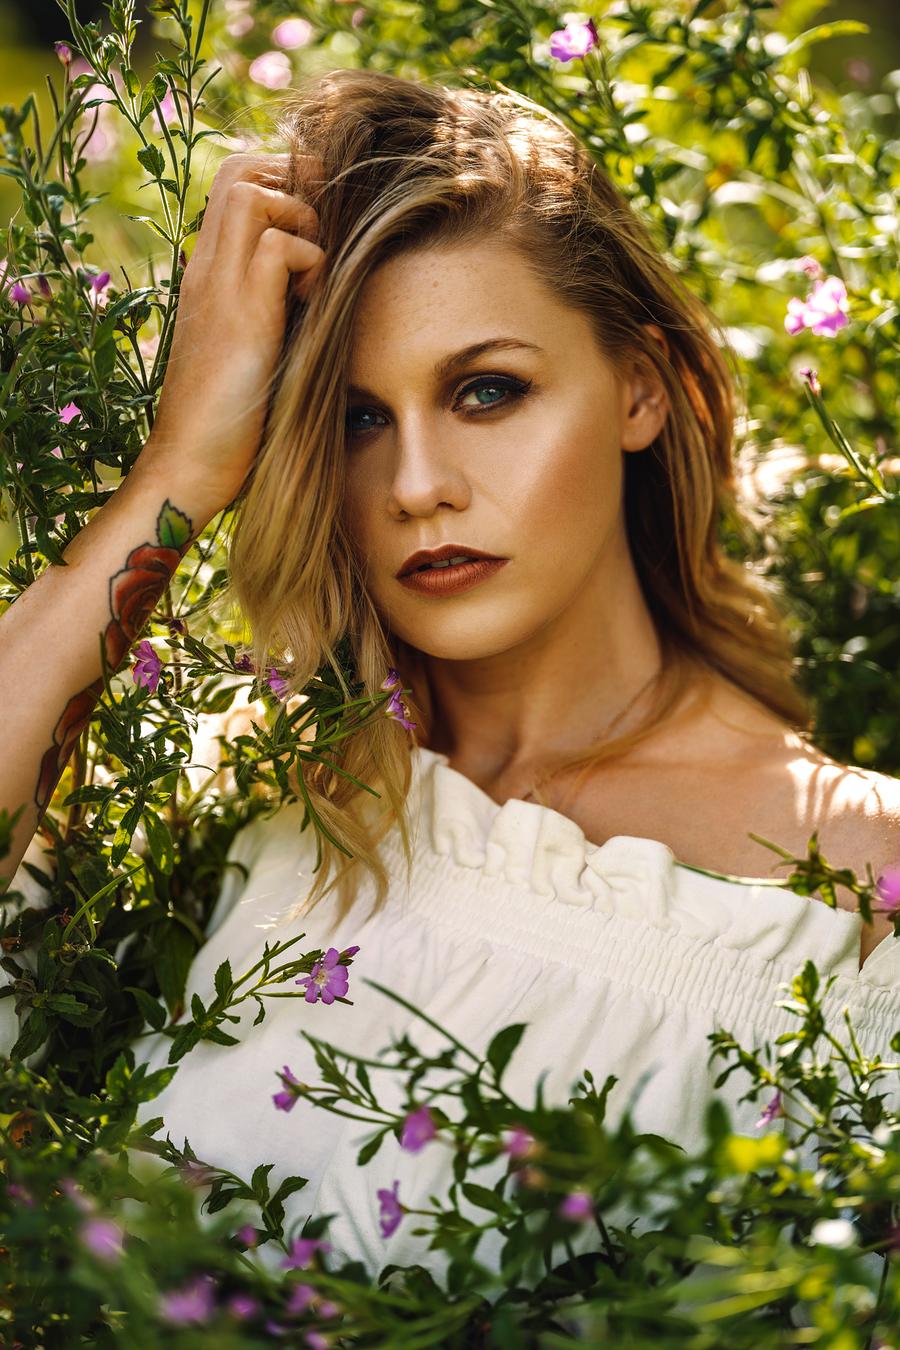 Lolita_Ward / Photography by Kirk Schwarz, Model Lolita_Ward, Makeup by Alice Snell Makeup Artist / Uploaded 14th August 2019 @ 09:24 AM